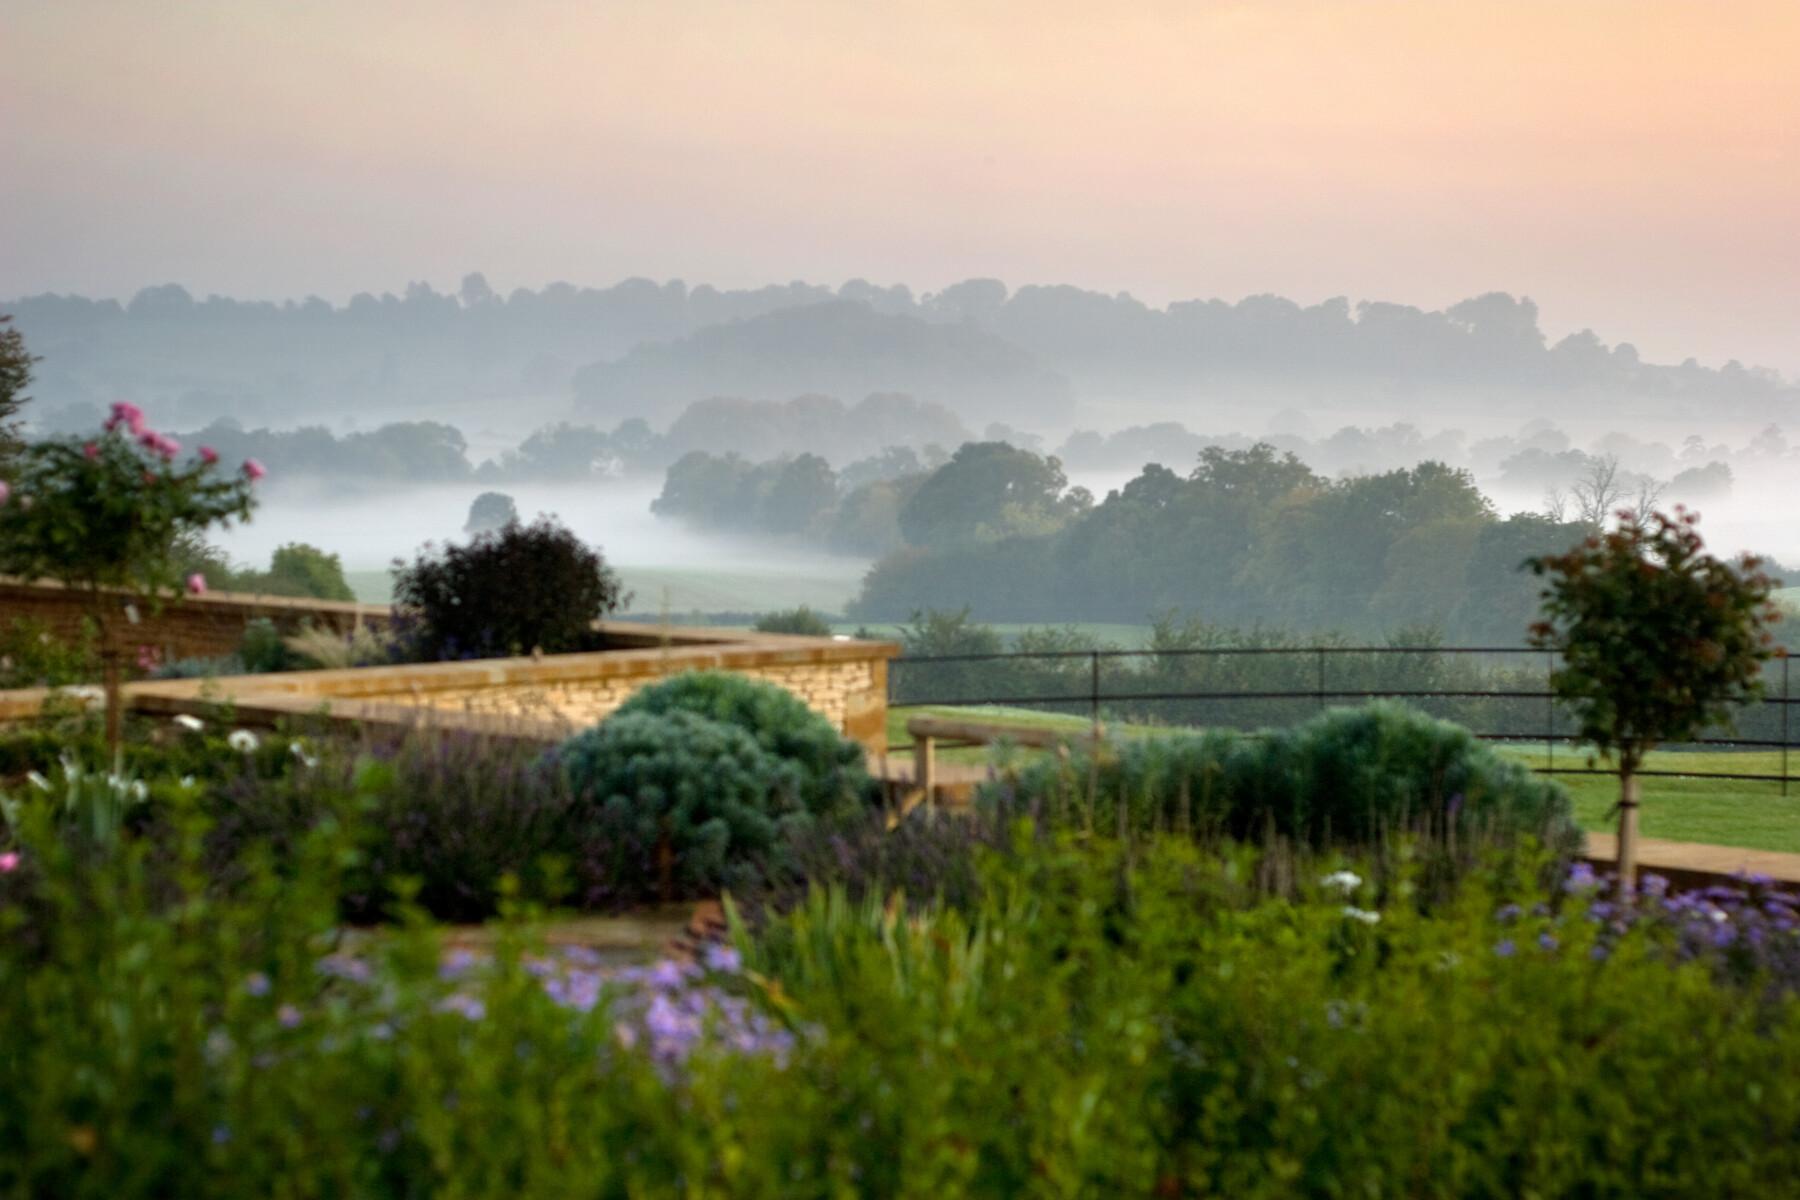 Nicholsons gardens